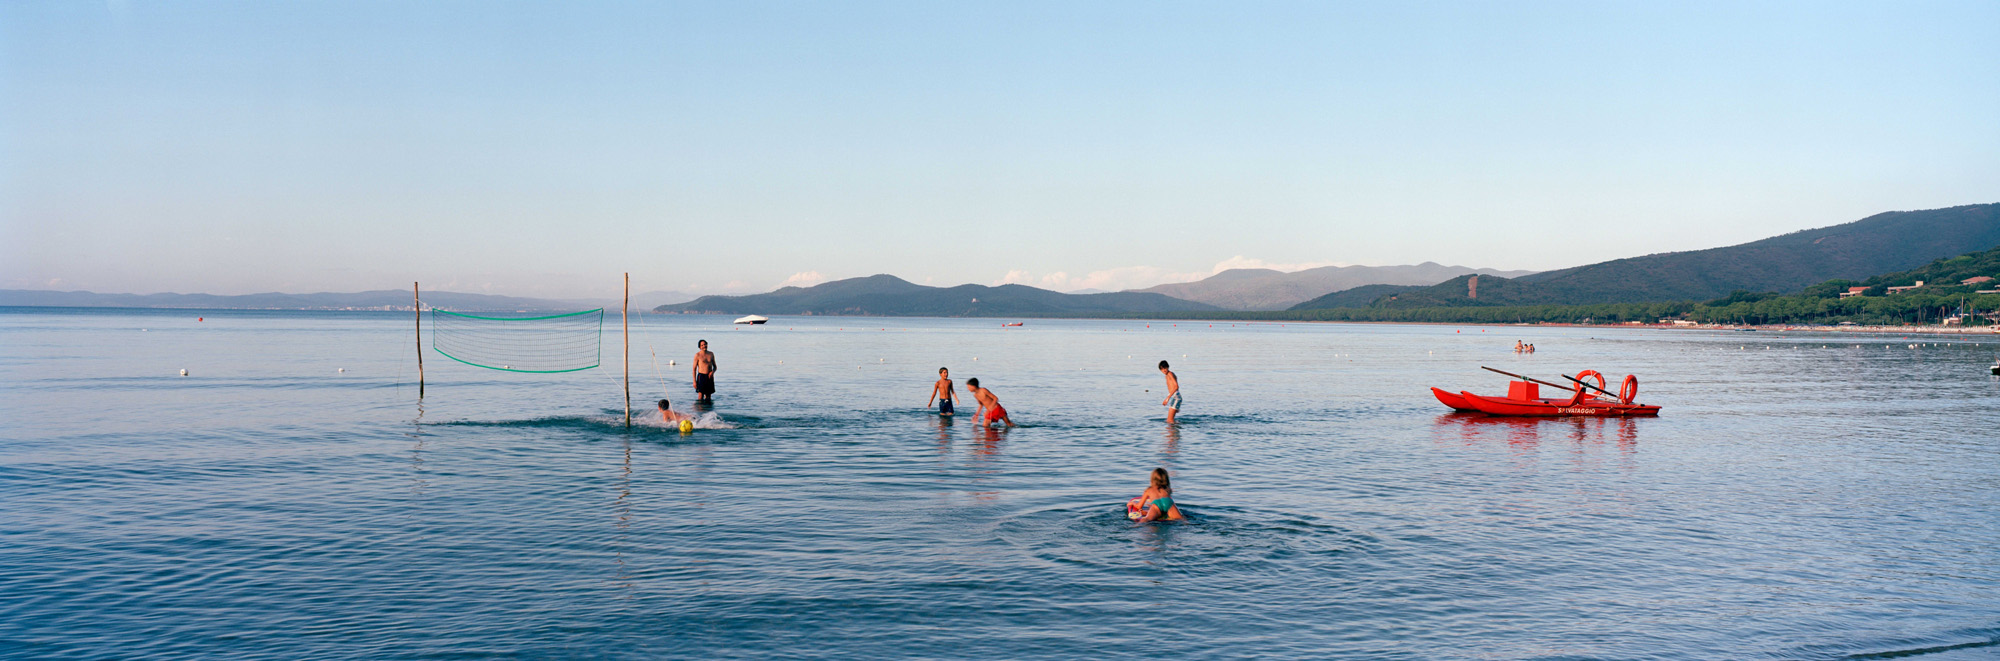 Acqua Partito, Punta Ala, Italy, 2003